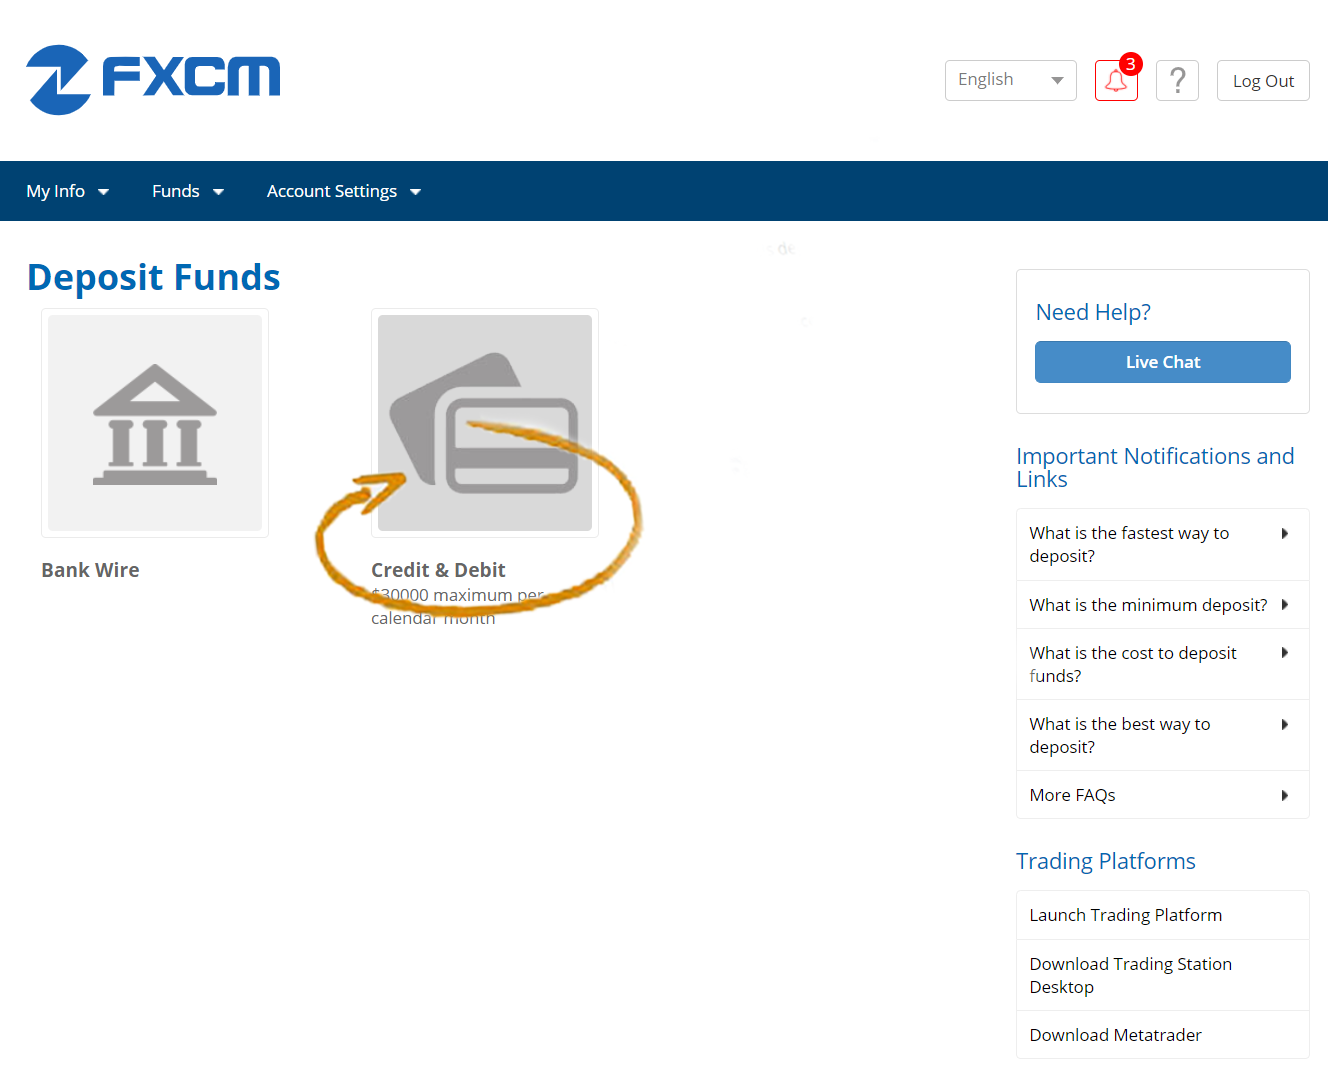 FXCM - MyFXCM Credit or Debit Option